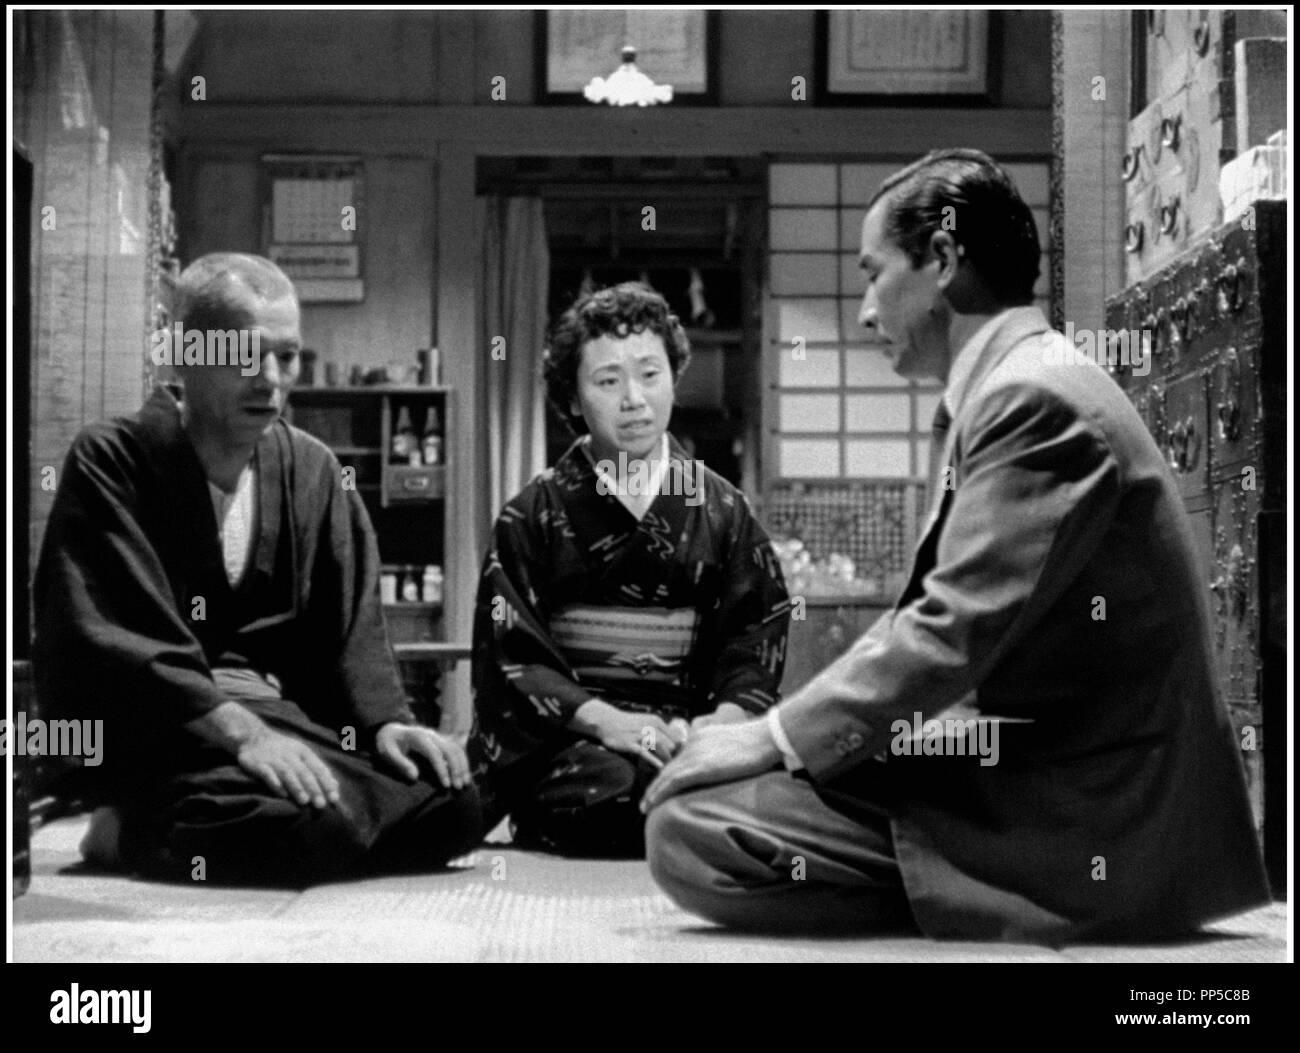 Forum on this topic: Ellen Marlow, momiji-yamamura/